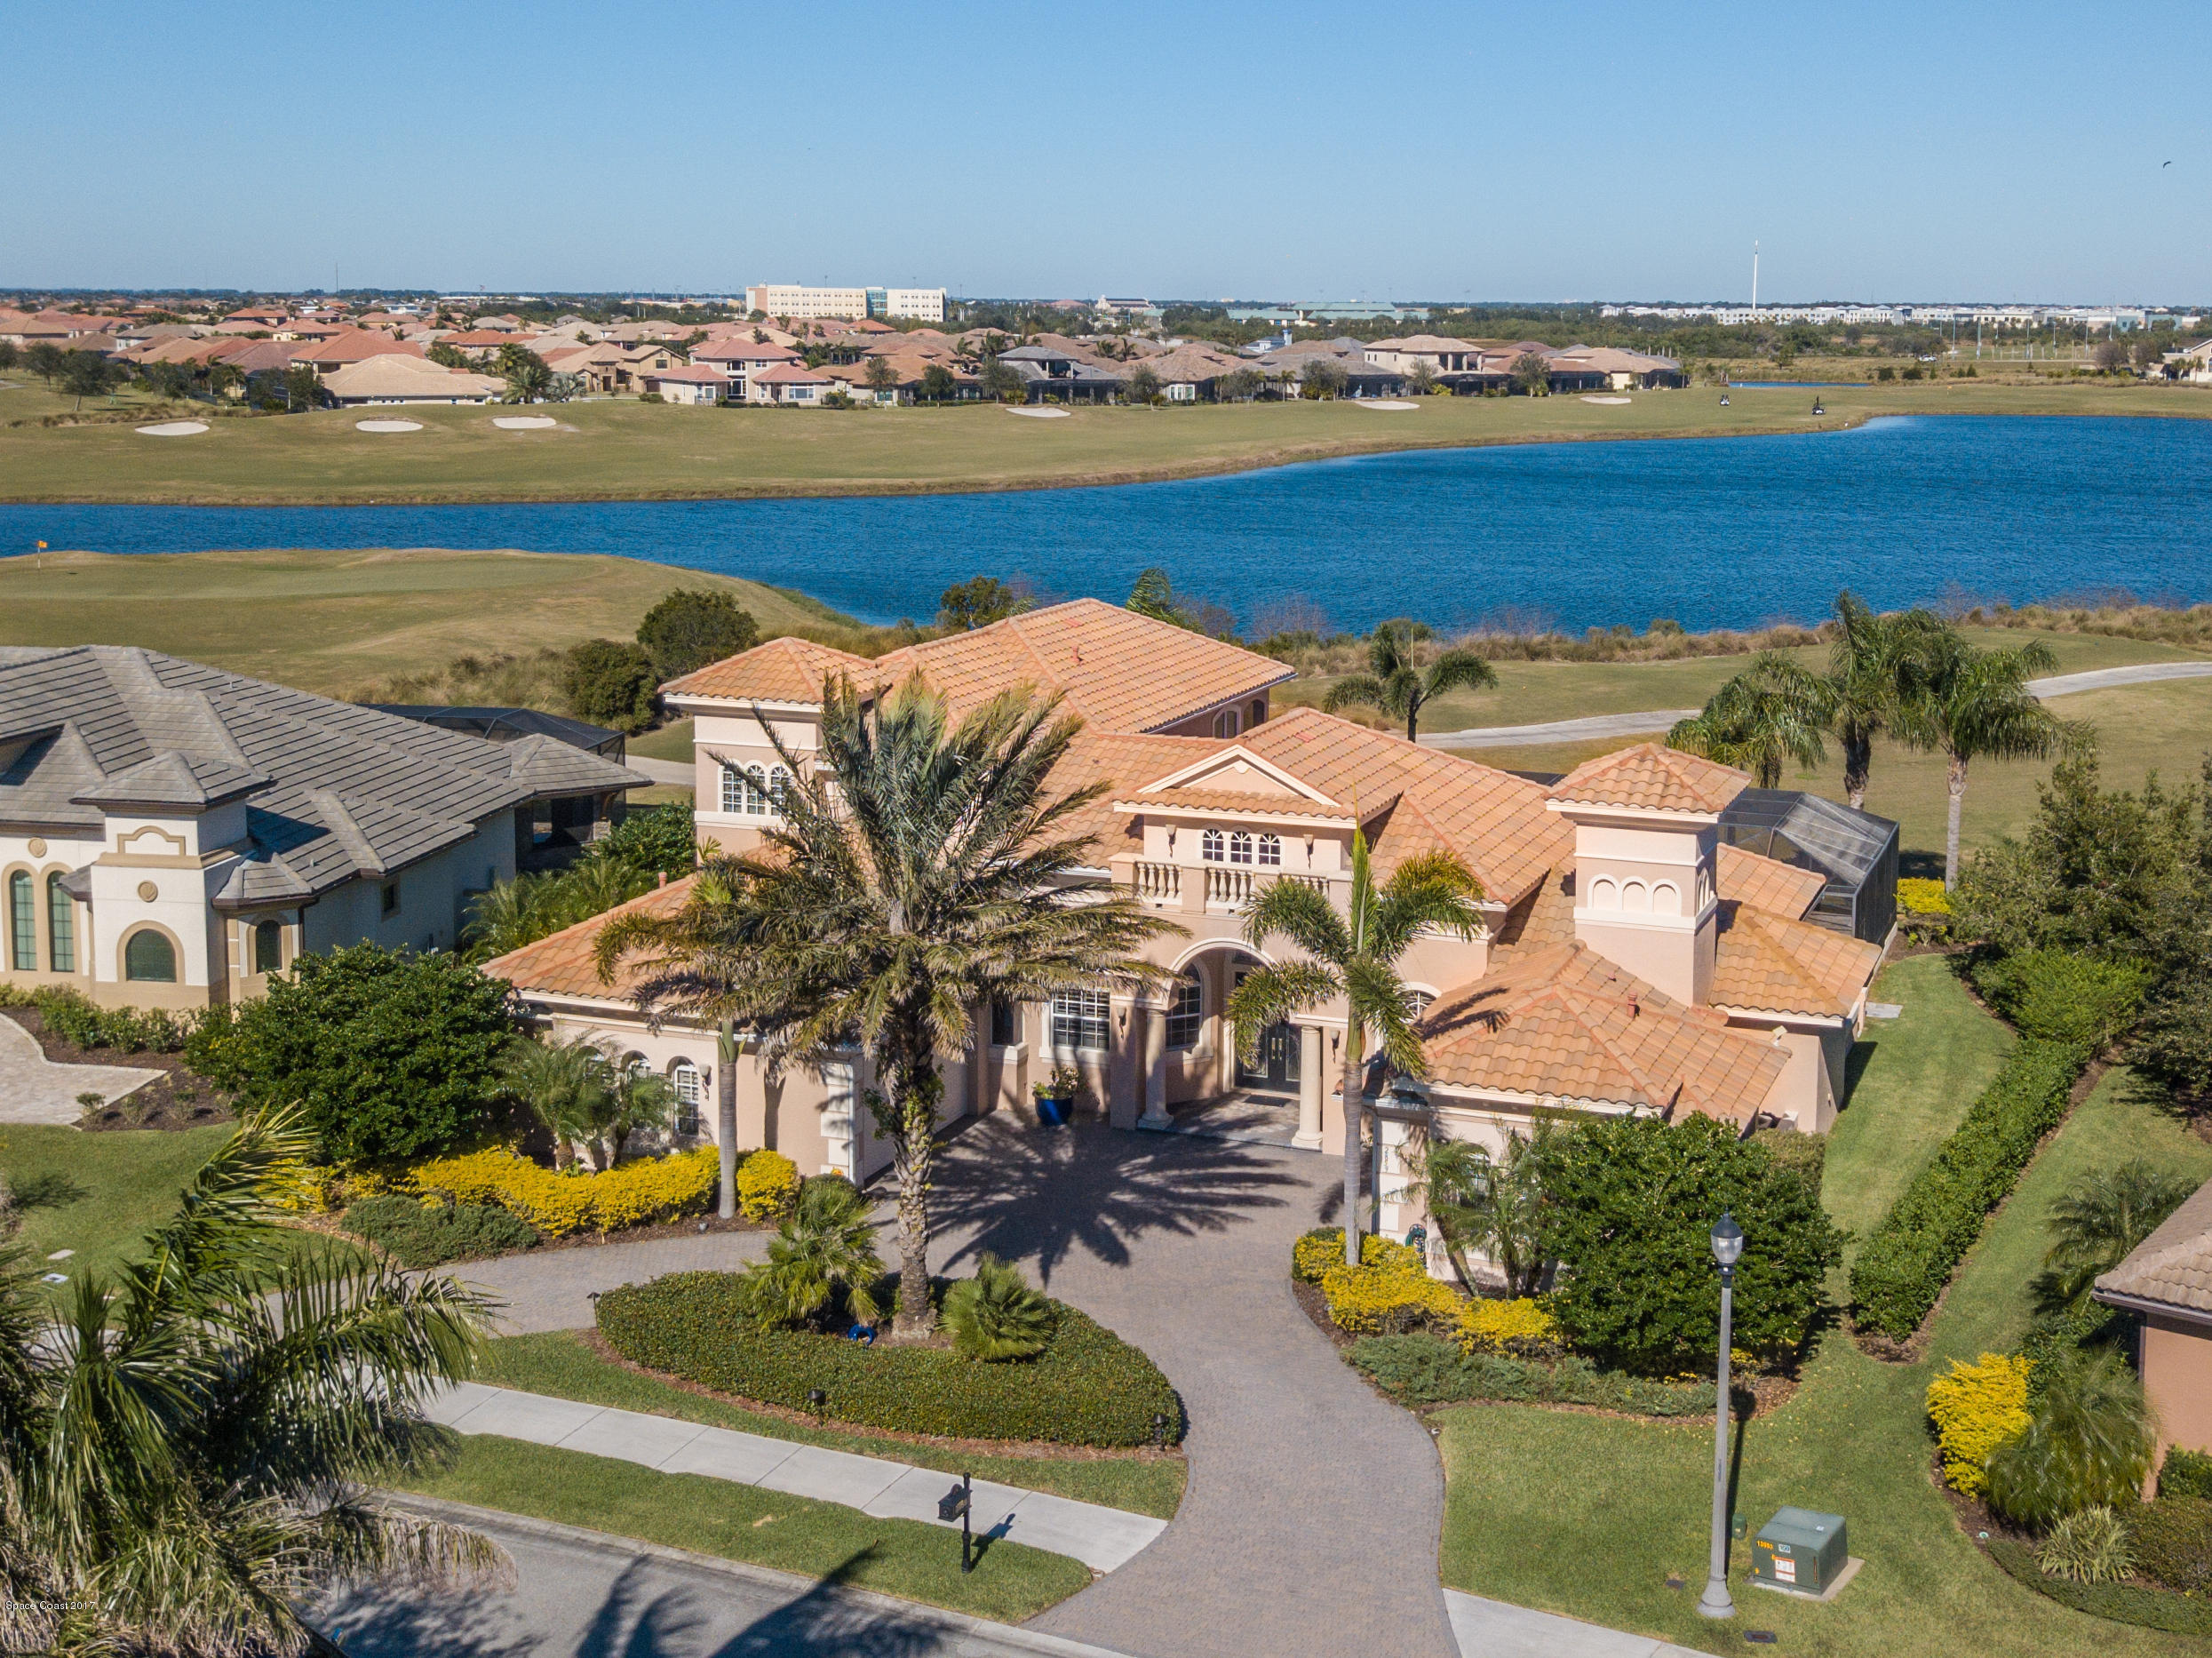 Villa per Vendita alle ore 2859 Wyndham 2859 Wyndham Melbourne, Florida 32940 Stati Uniti